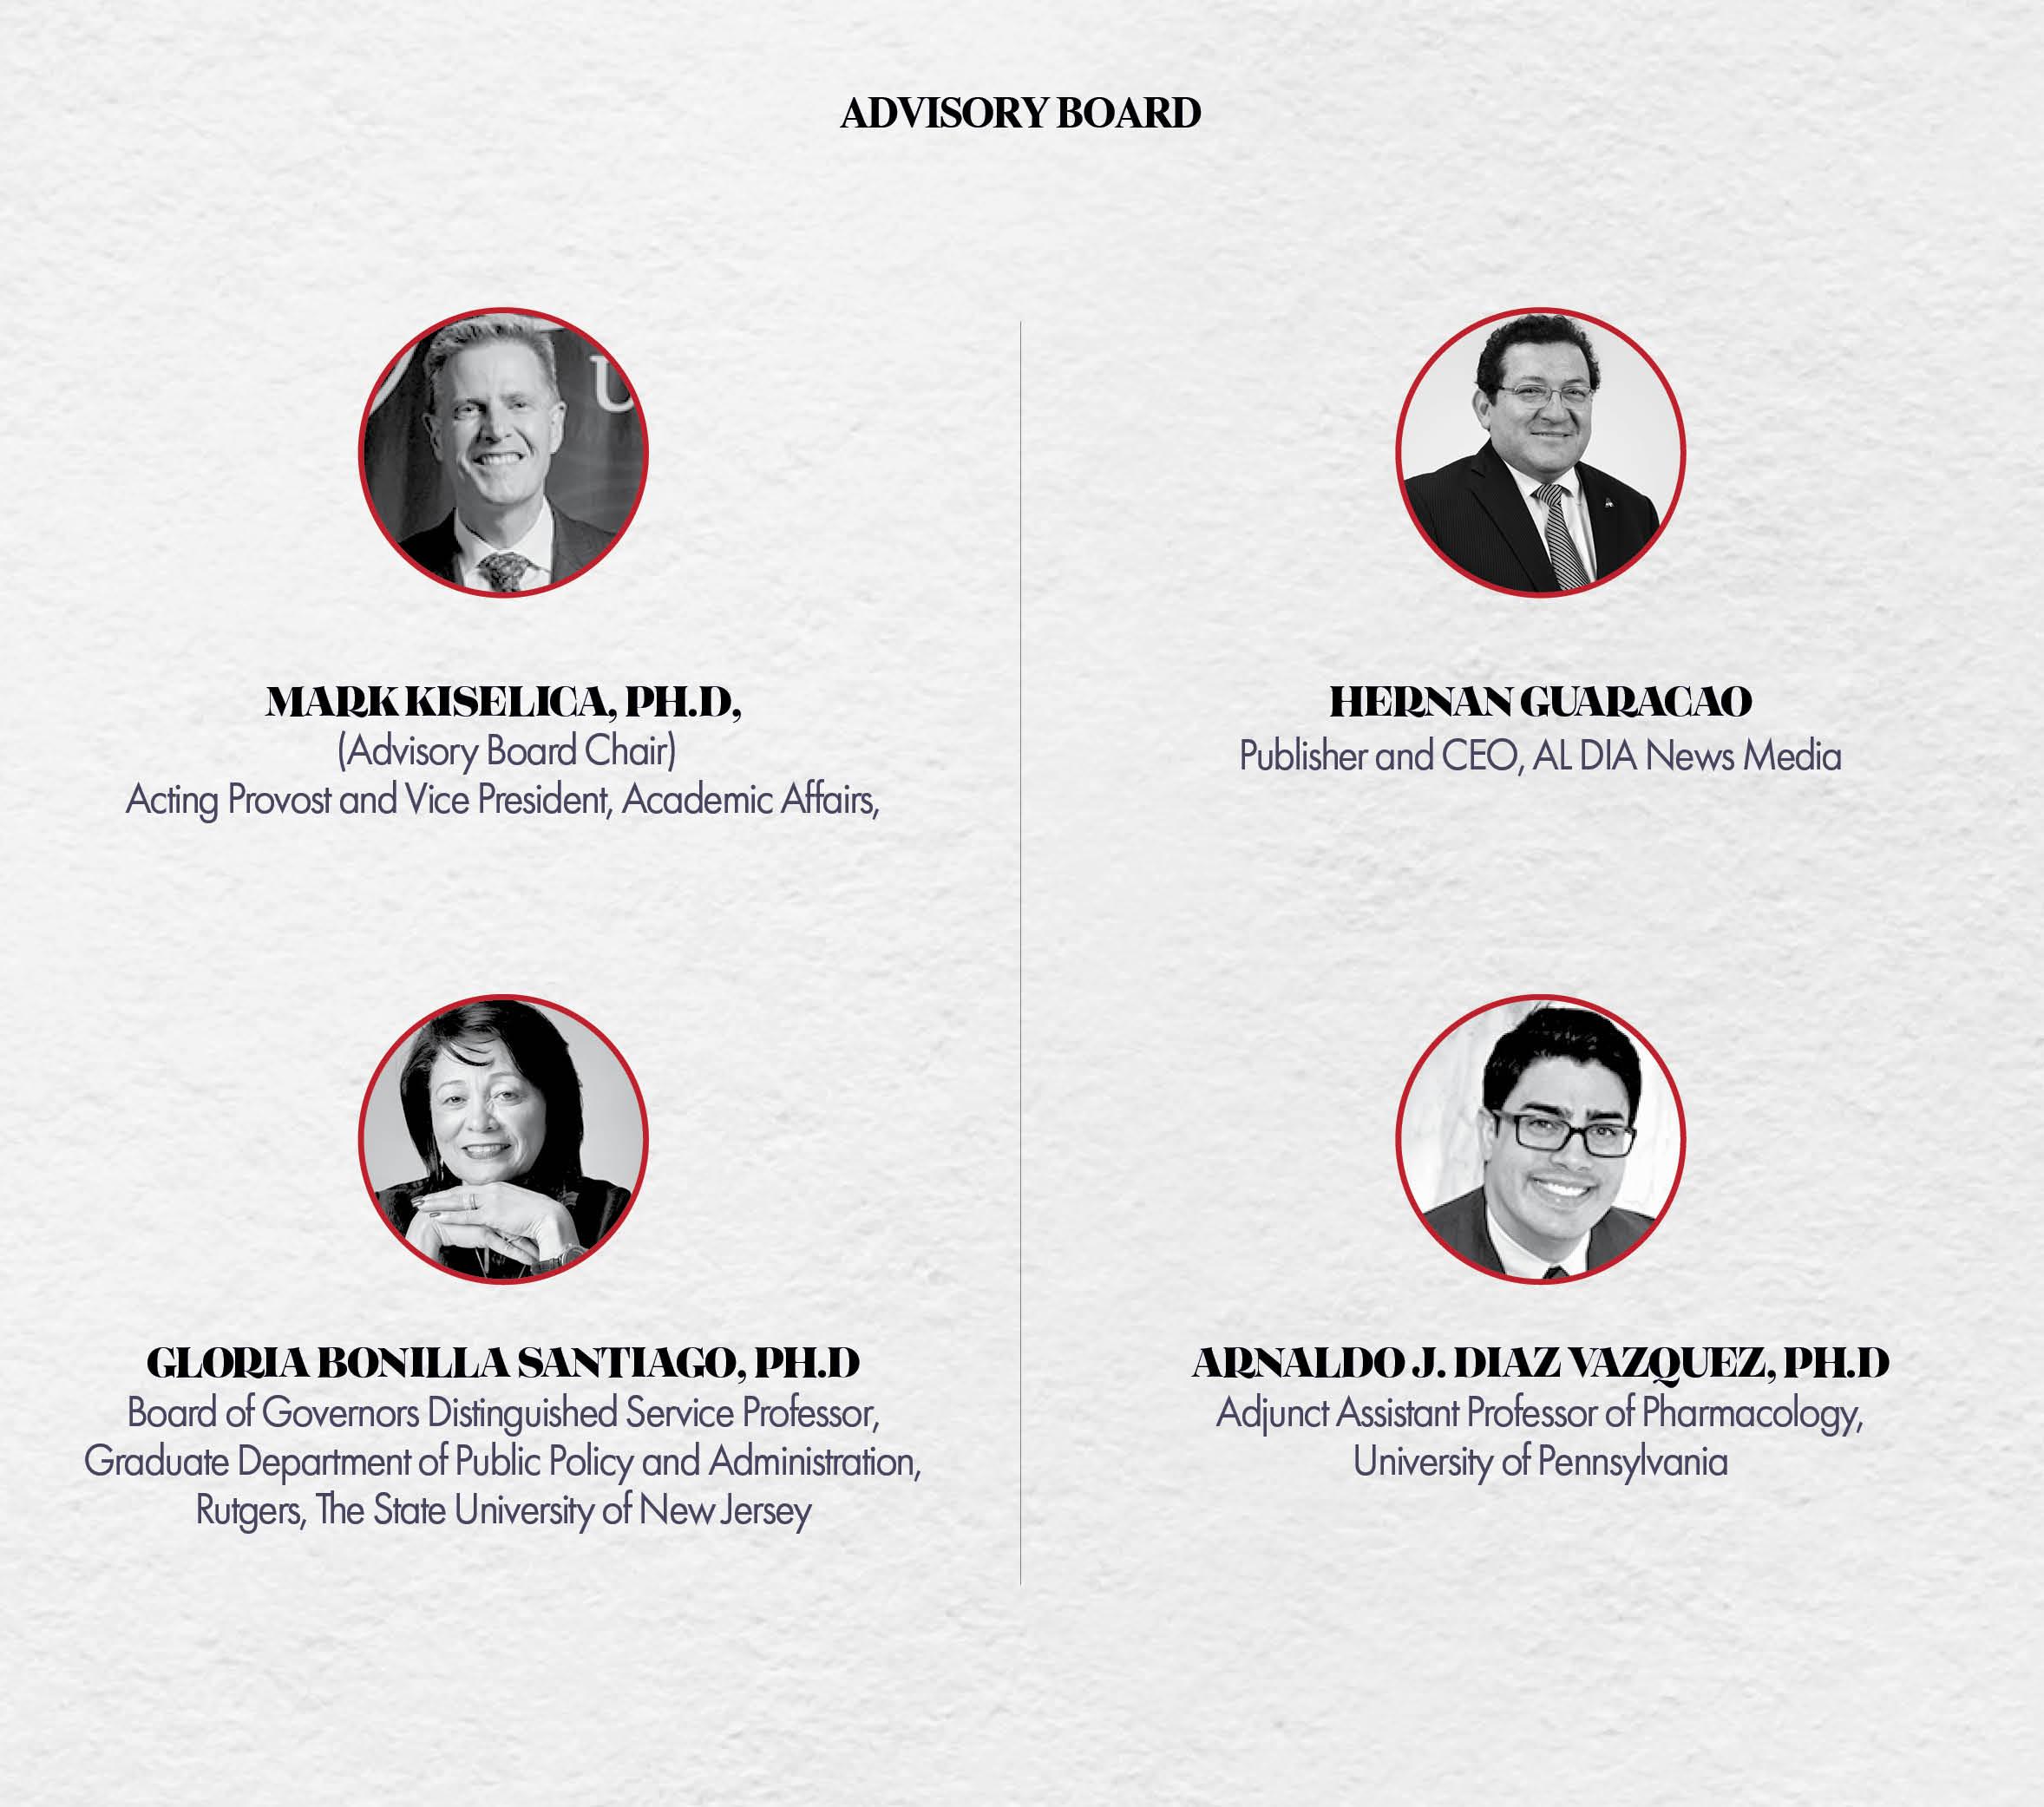 2019 Higher Education Summit Advisory Board